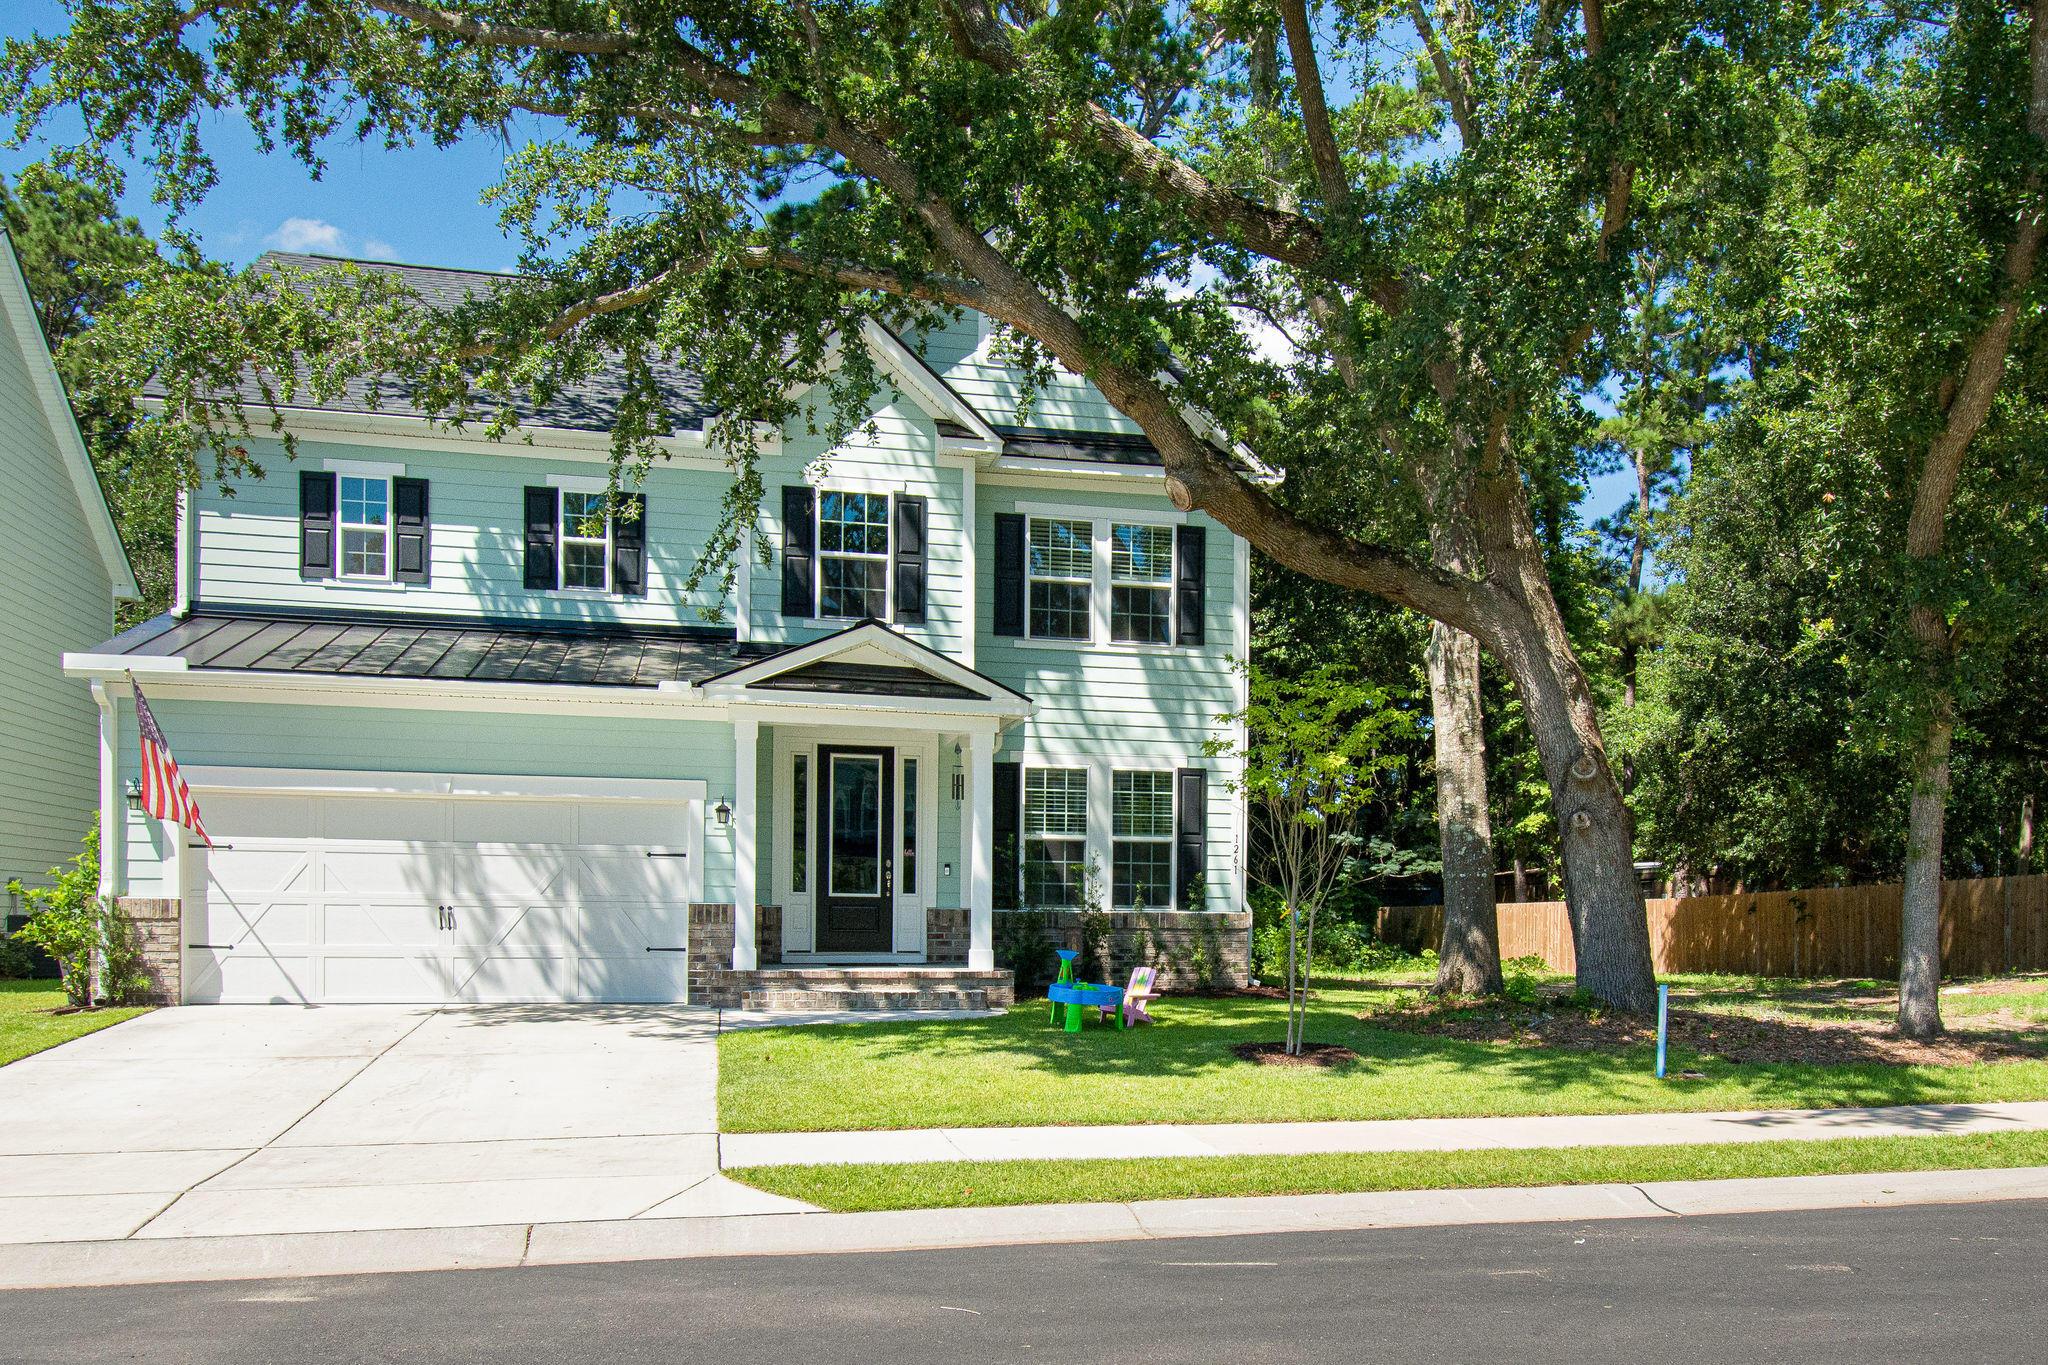 Magnolia Village Homes For Sale - 1261 Pearwood, Mount Pleasant, SC - 0